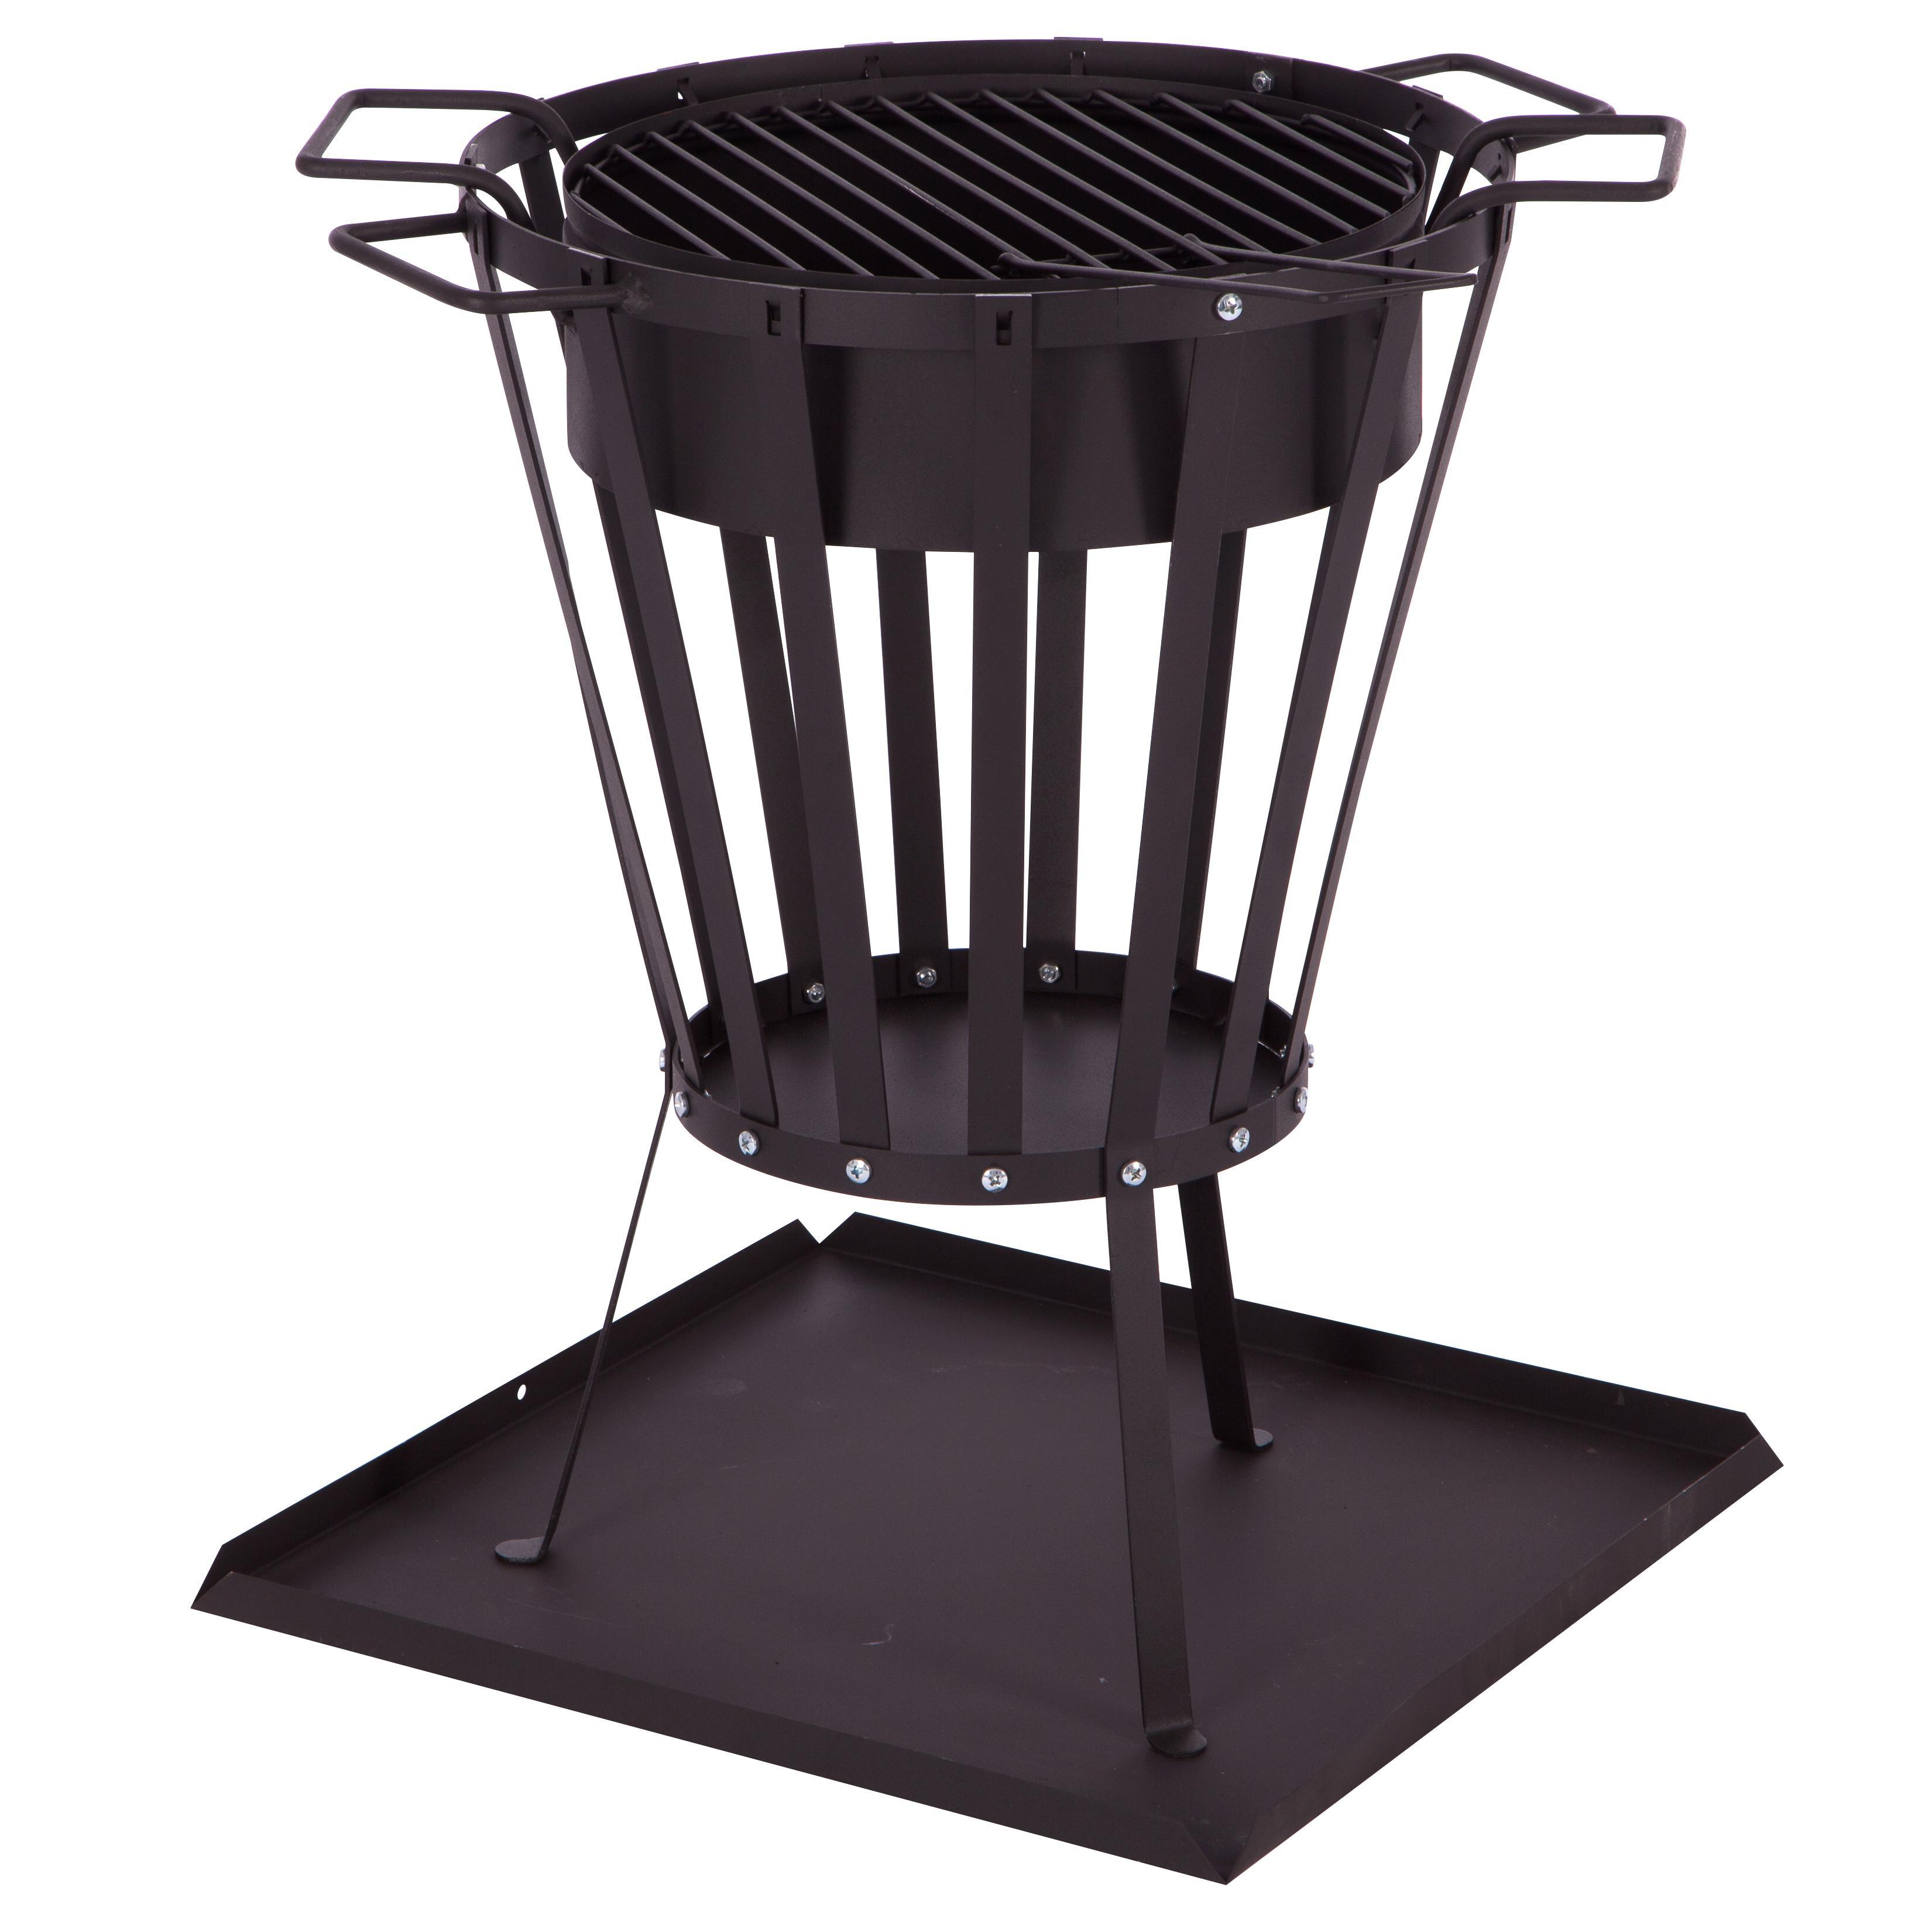 ultranatura feuerkorb vulcano aufbau set inkl ascheschale mit grilleinsatz 32 x 32 x 10 cm. Black Bedroom Furniture Sets. Home Design Ideas